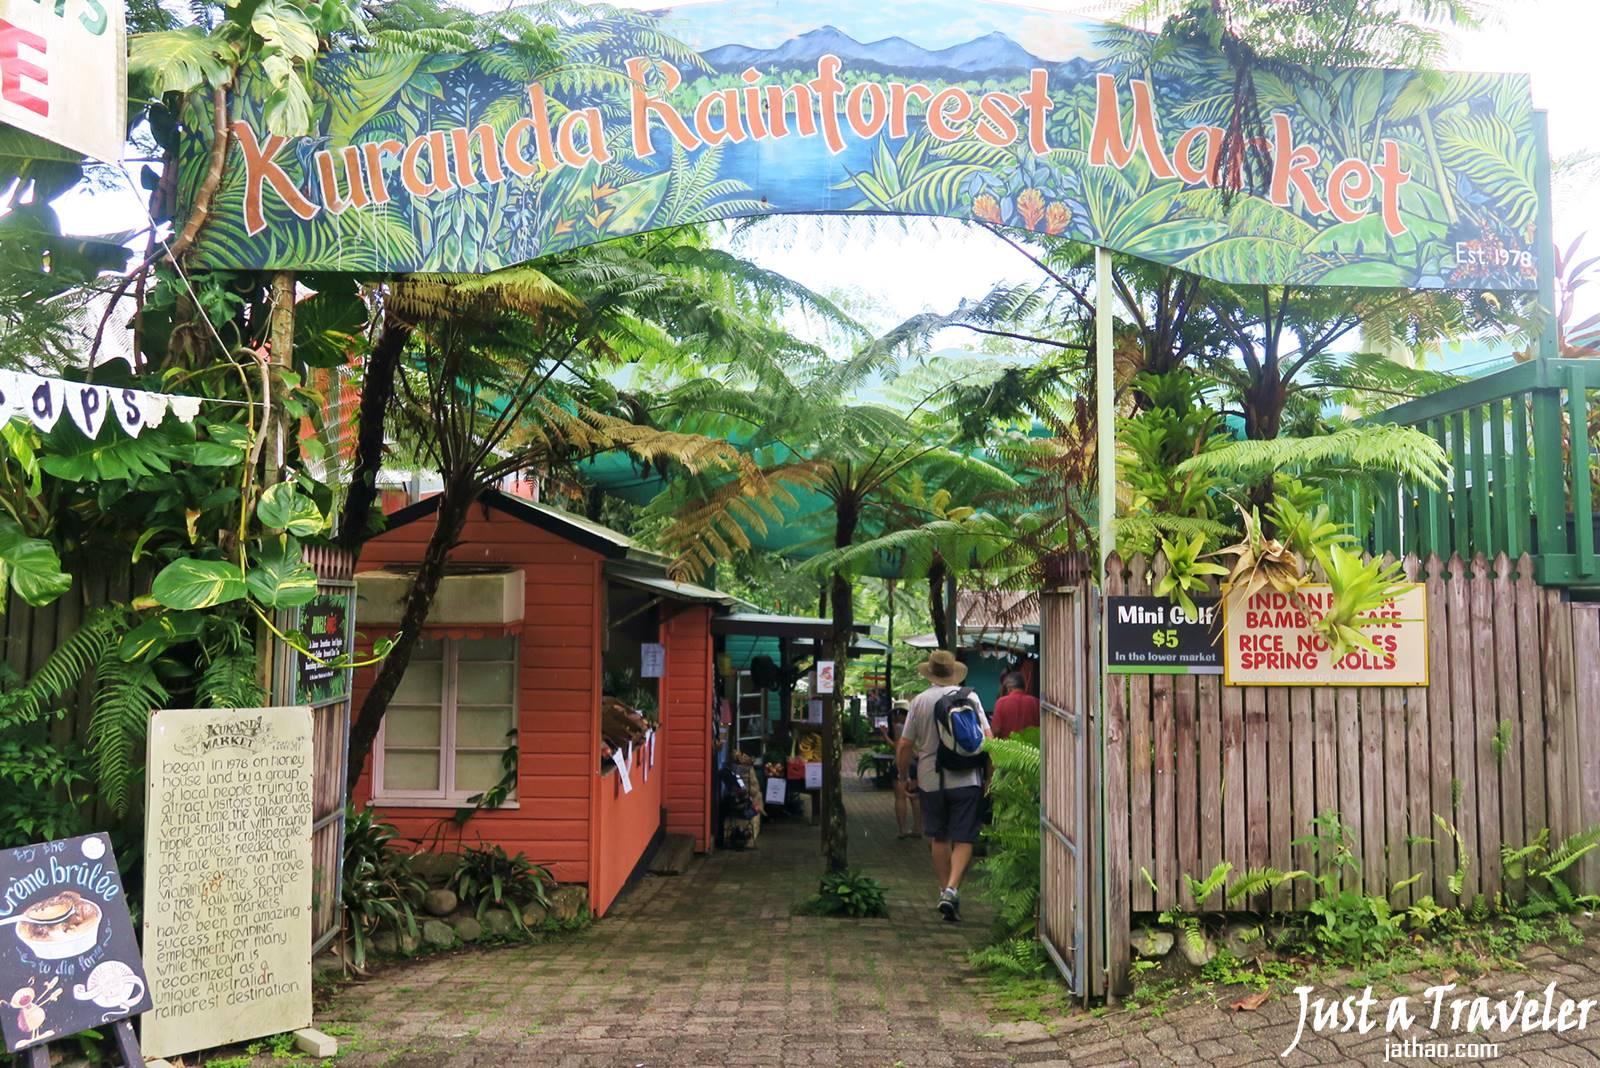 凱恩斯-庫蘭達-景點-雨林市集-自由行-旅遊-澳洲-Cairns-Kuranda-Market-Travel-Tourist-Attraction-Australia